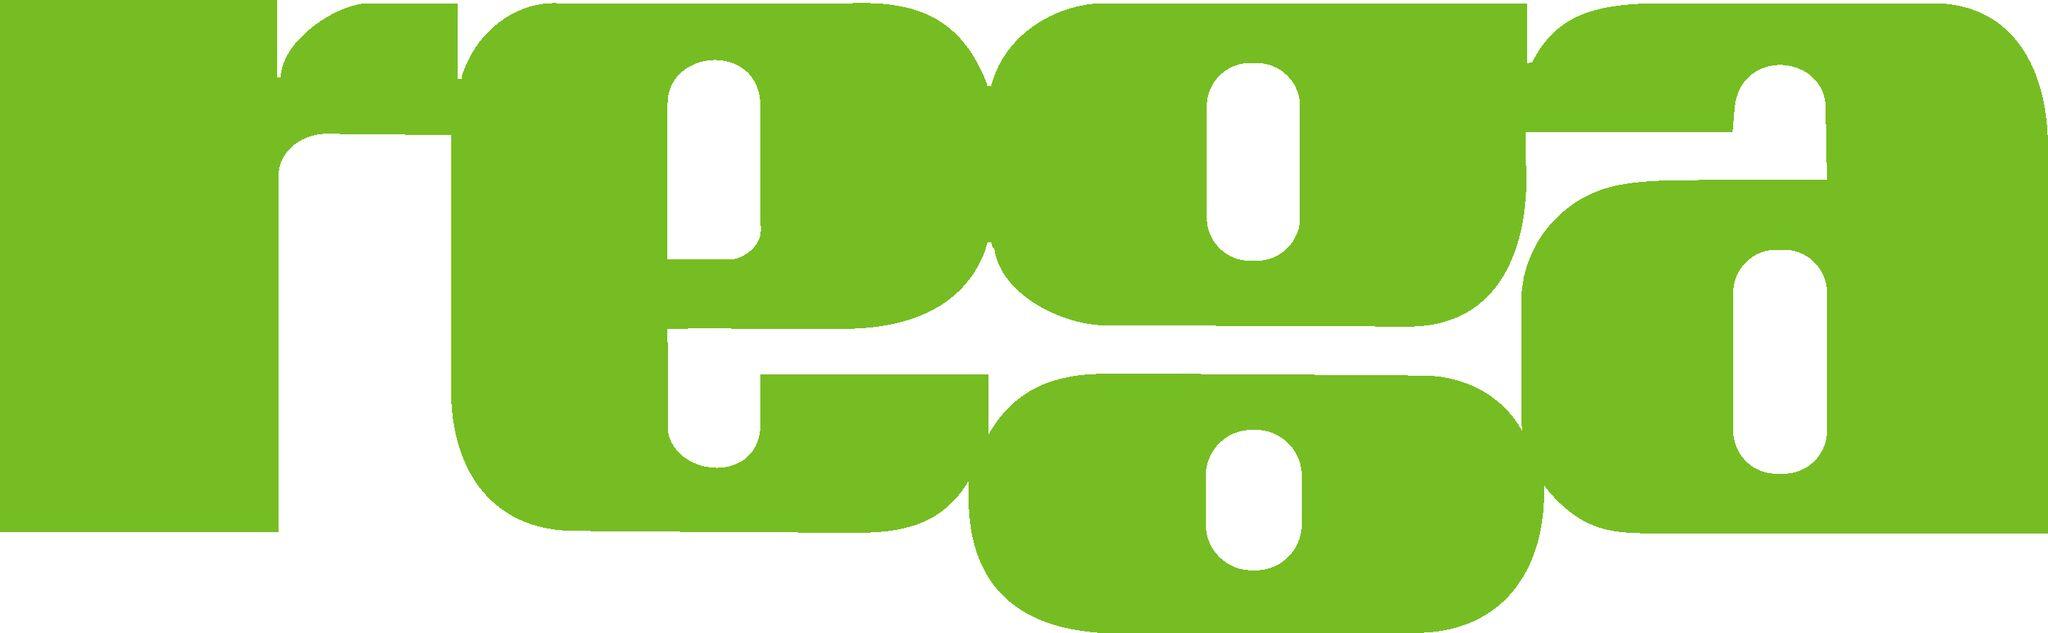 REGA LOGO HIGH RES 2018 pantone 368c_preview - Spinning Discs